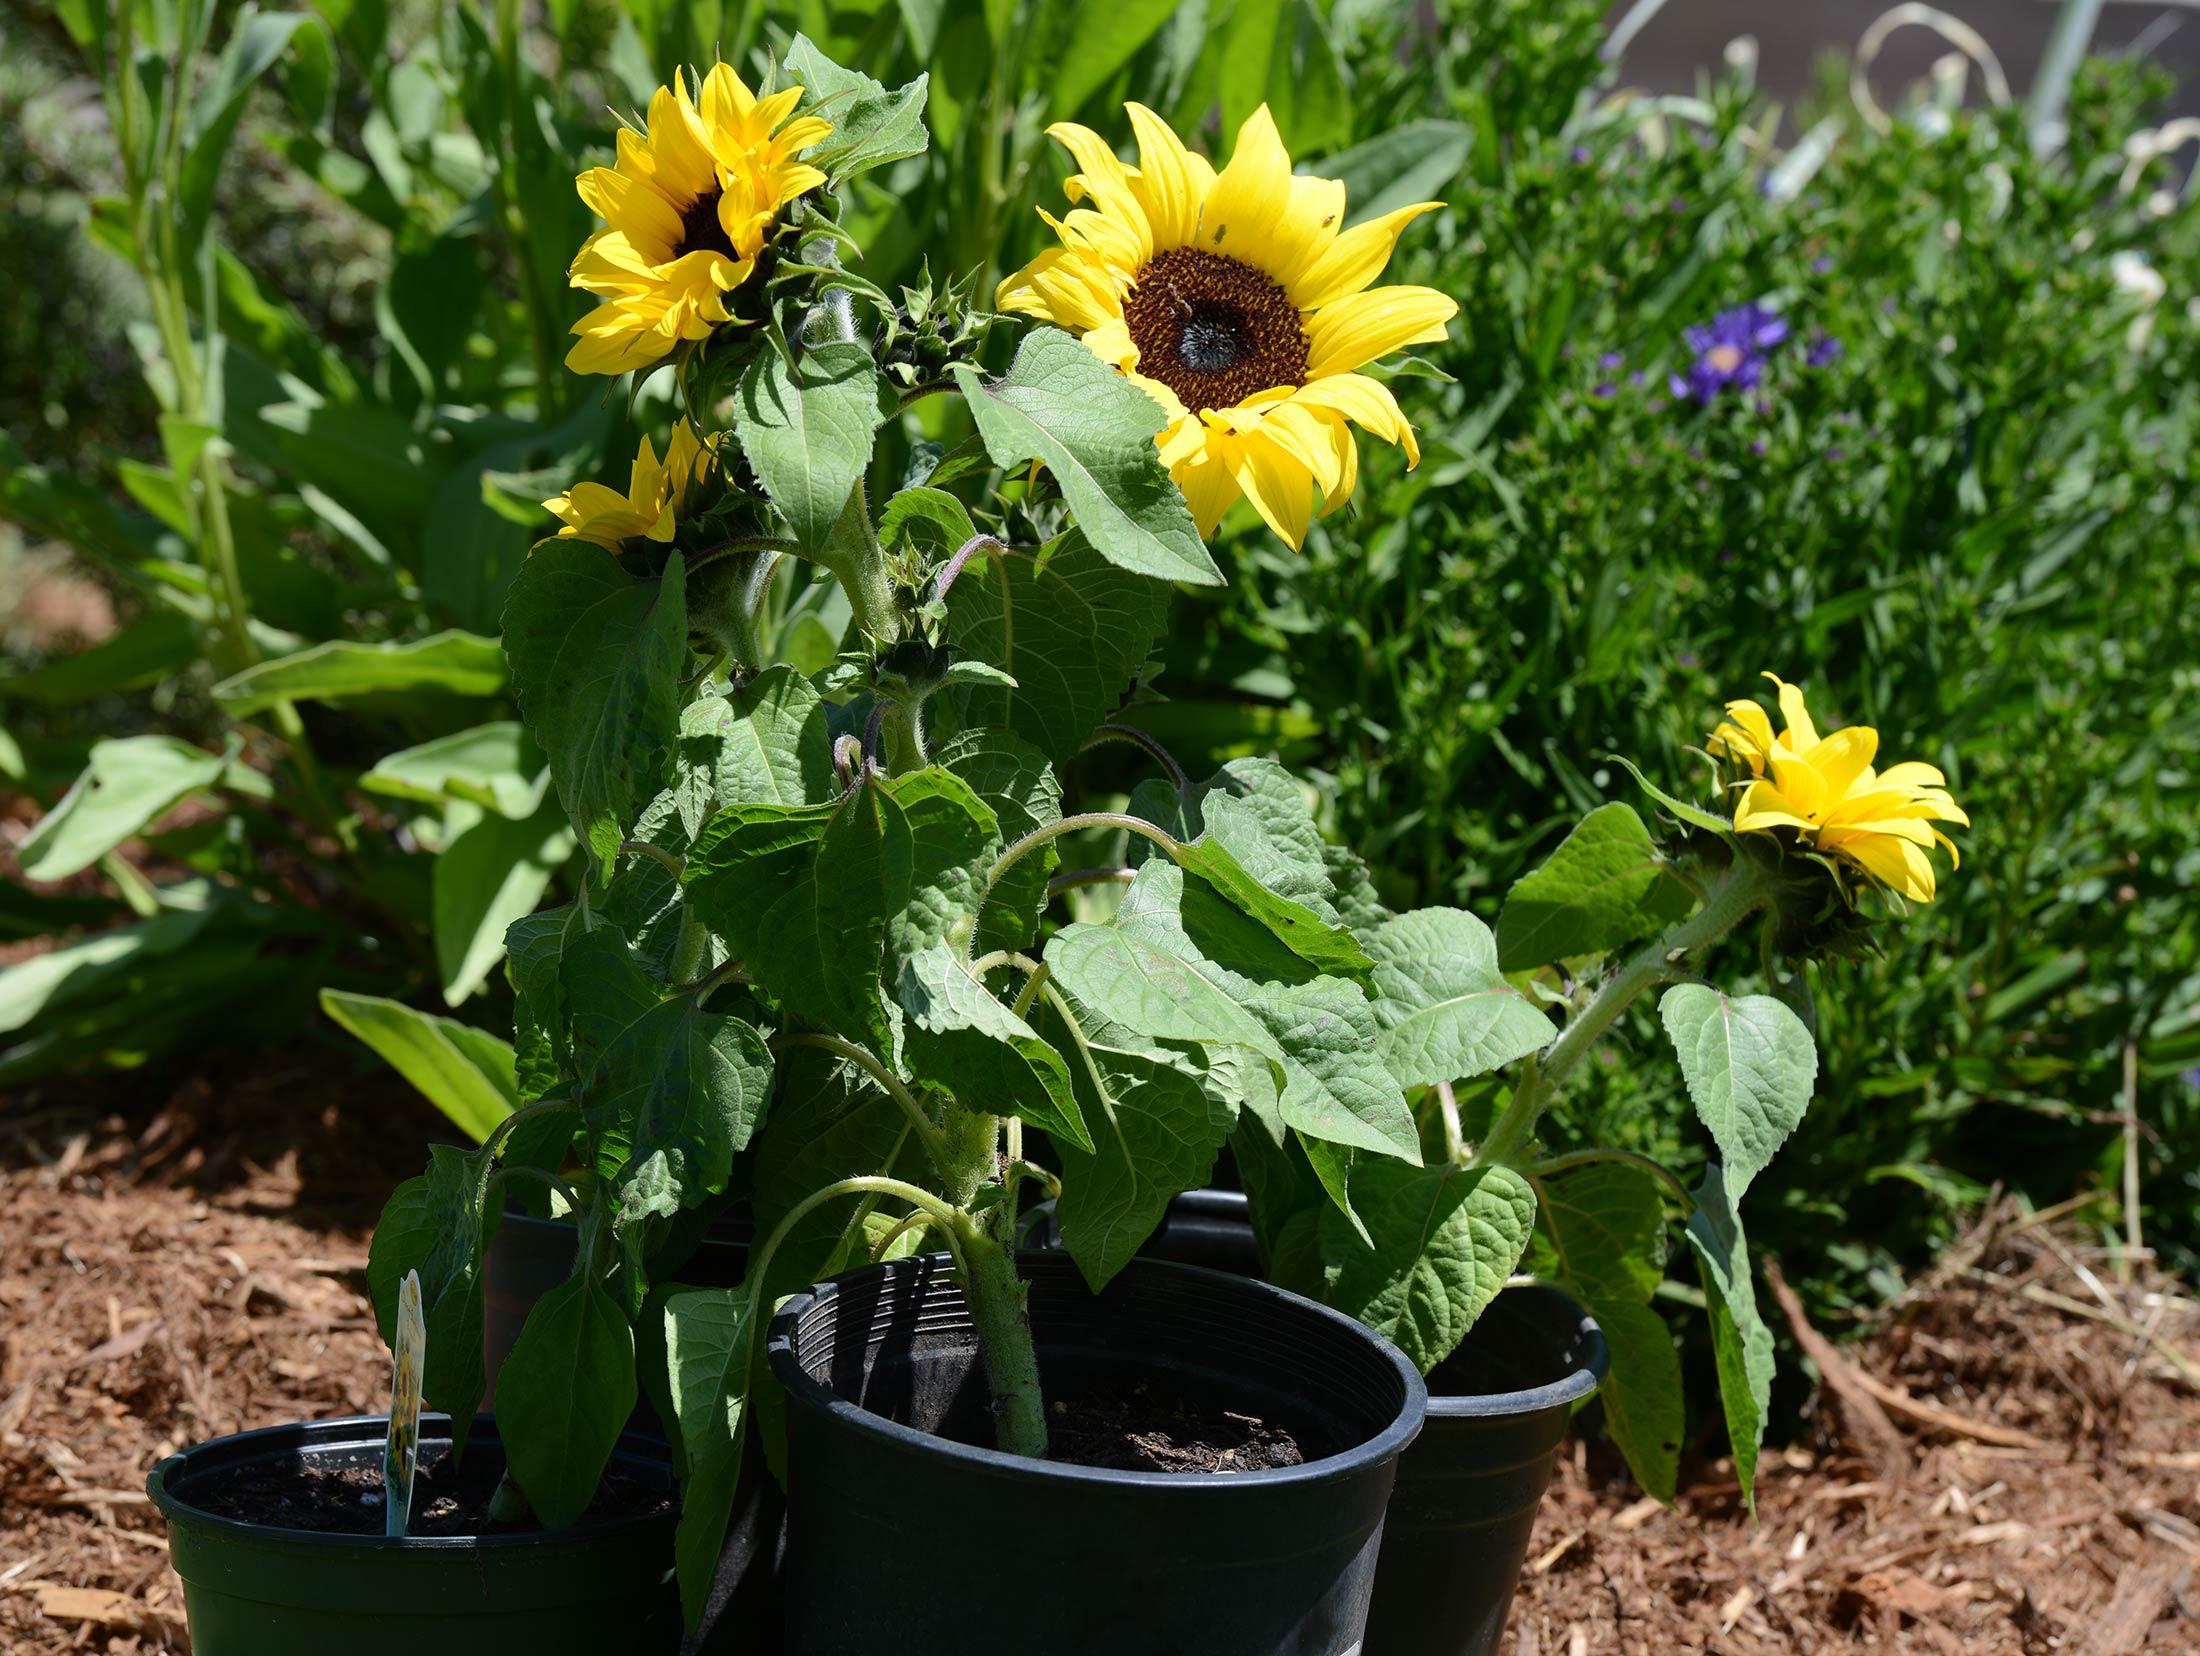 Sunflower_DSC_2577